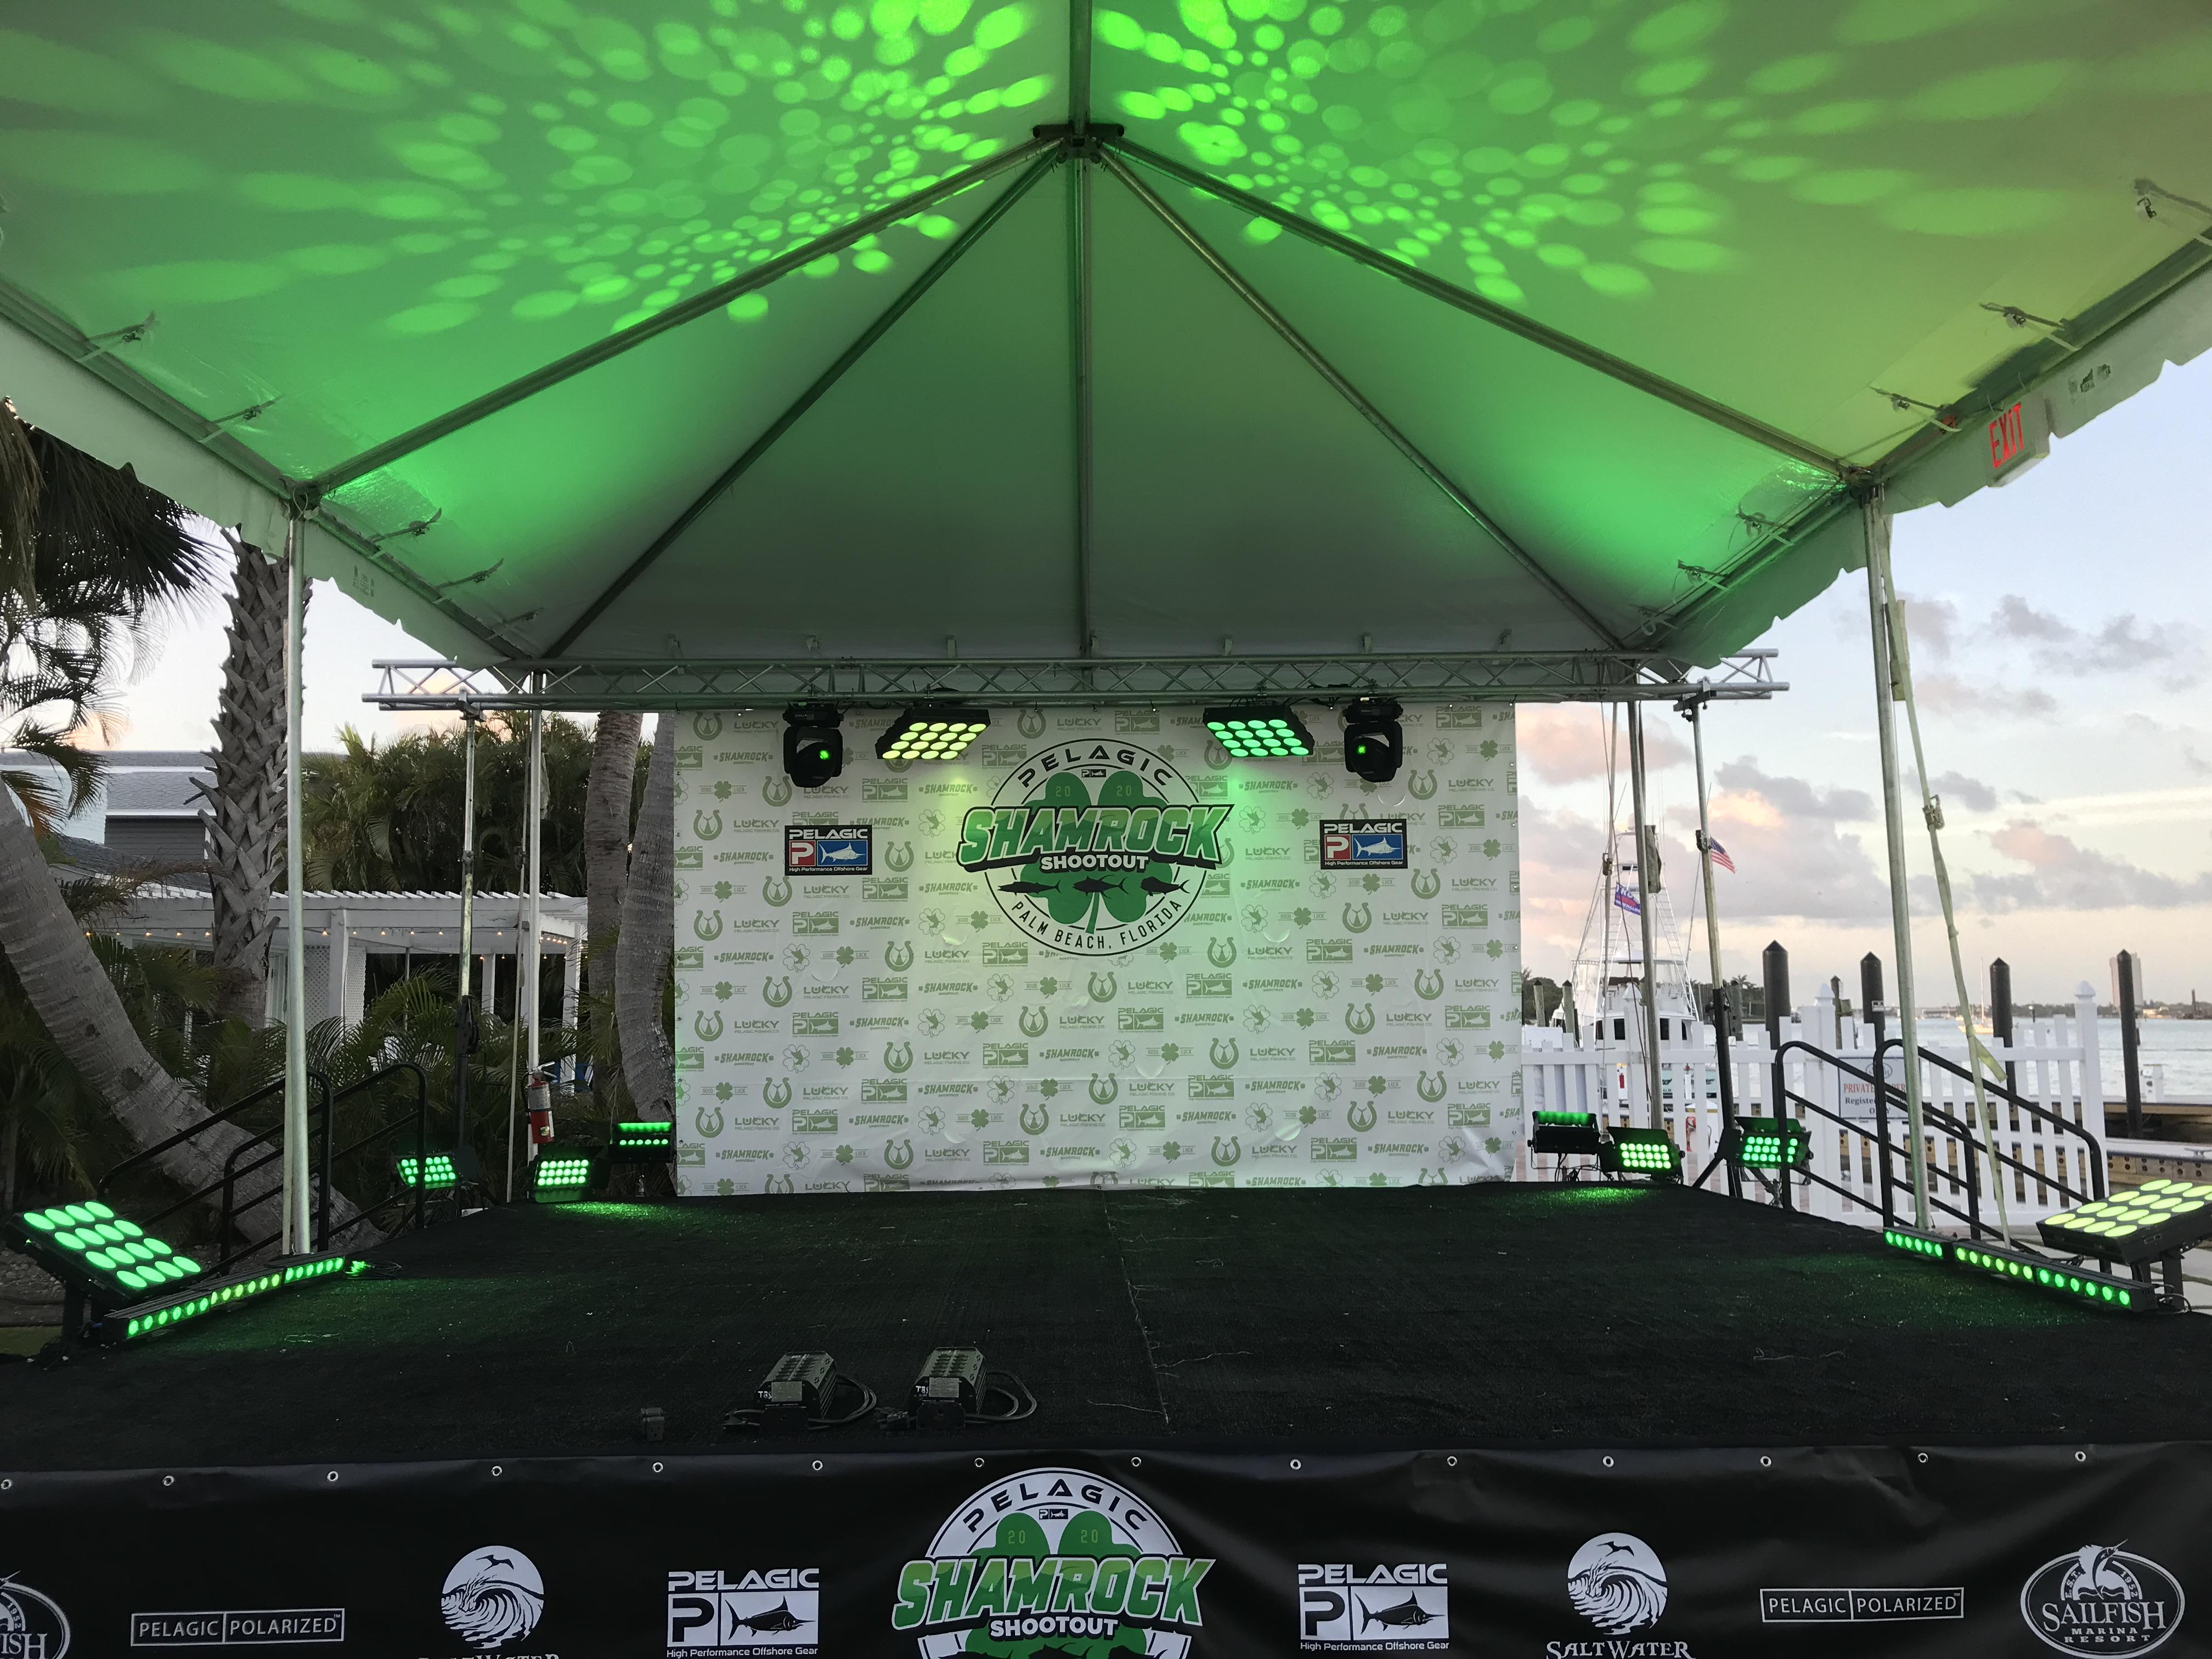 Lighting, fishing tournament, PELAGIC Shamrock Shootout, at Sailfish Marina, Palm Beach Shores, FL